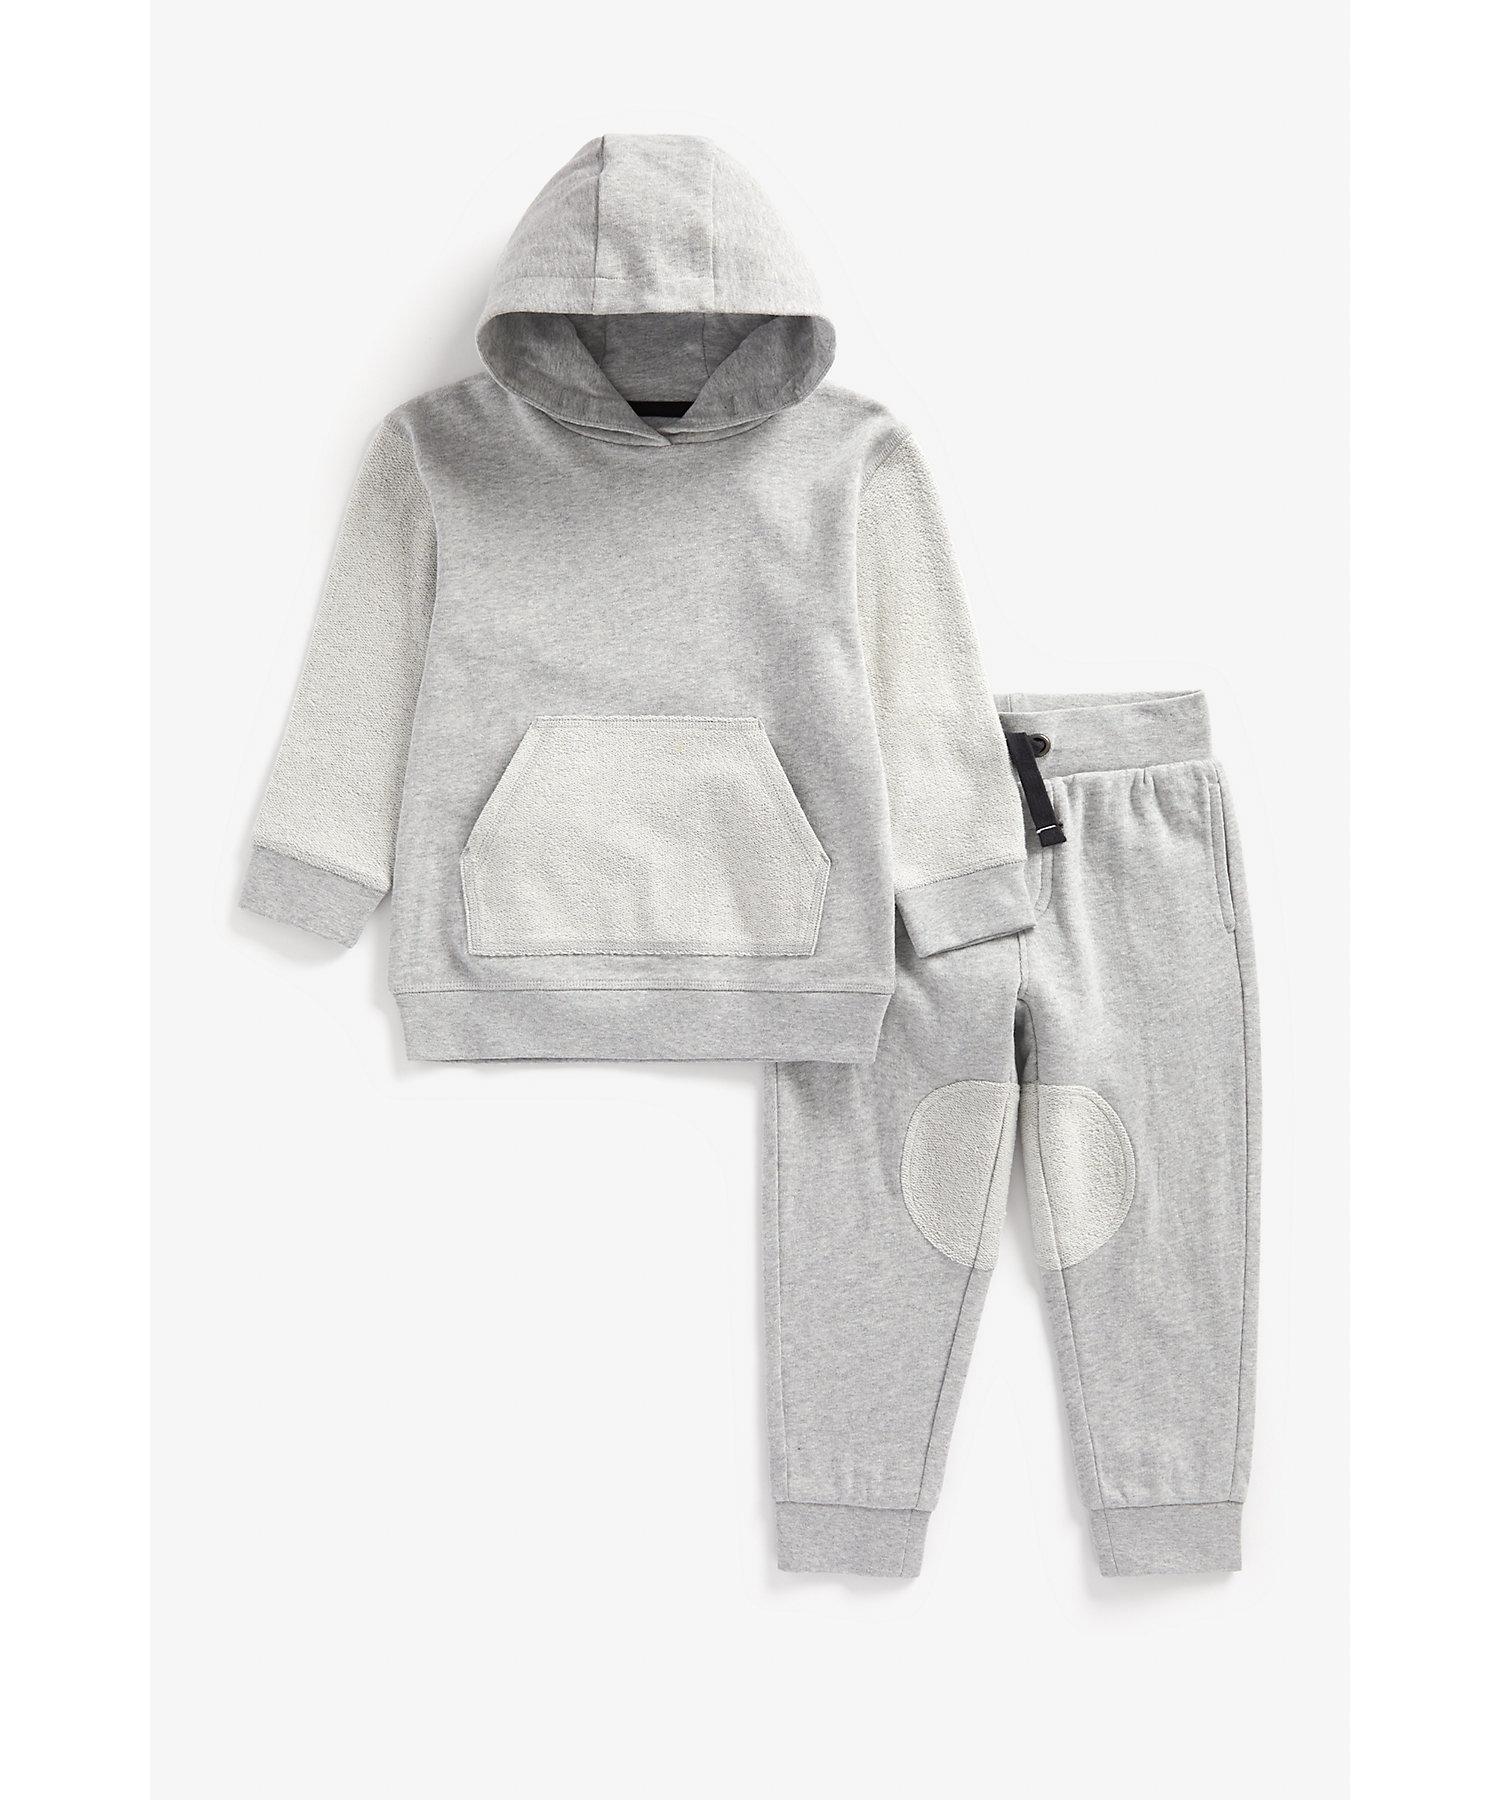 Mothercare | Boys Full Sleeves Jog Set Hooded - Grey